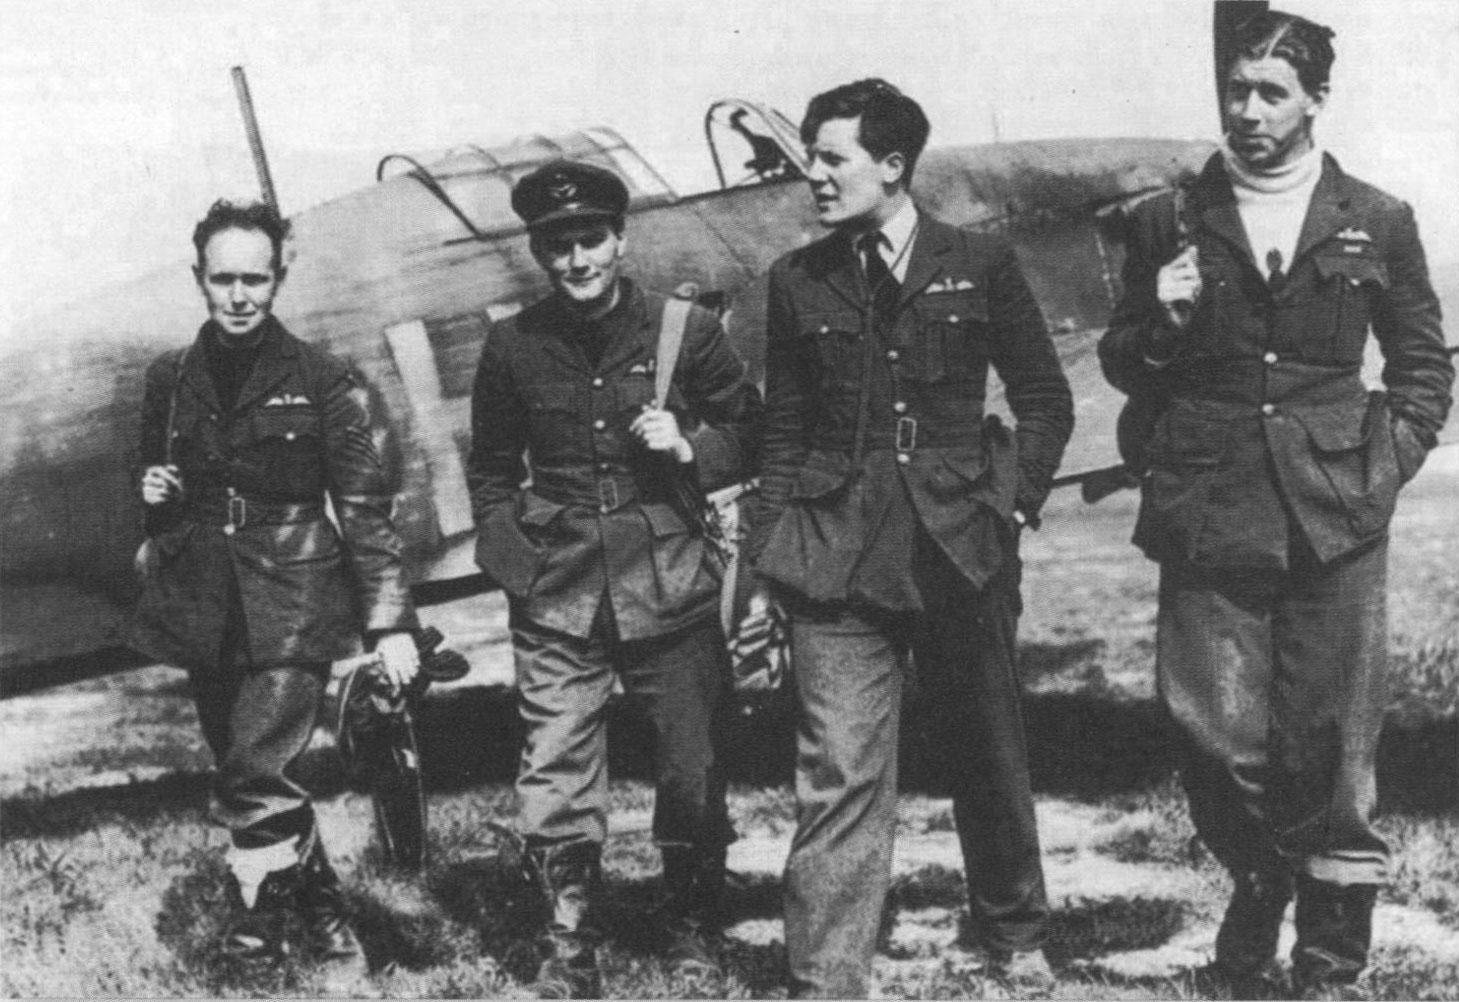 Aircrew RAF 73Sqn pilots with EJ Cobber Kain far left France 1940 01